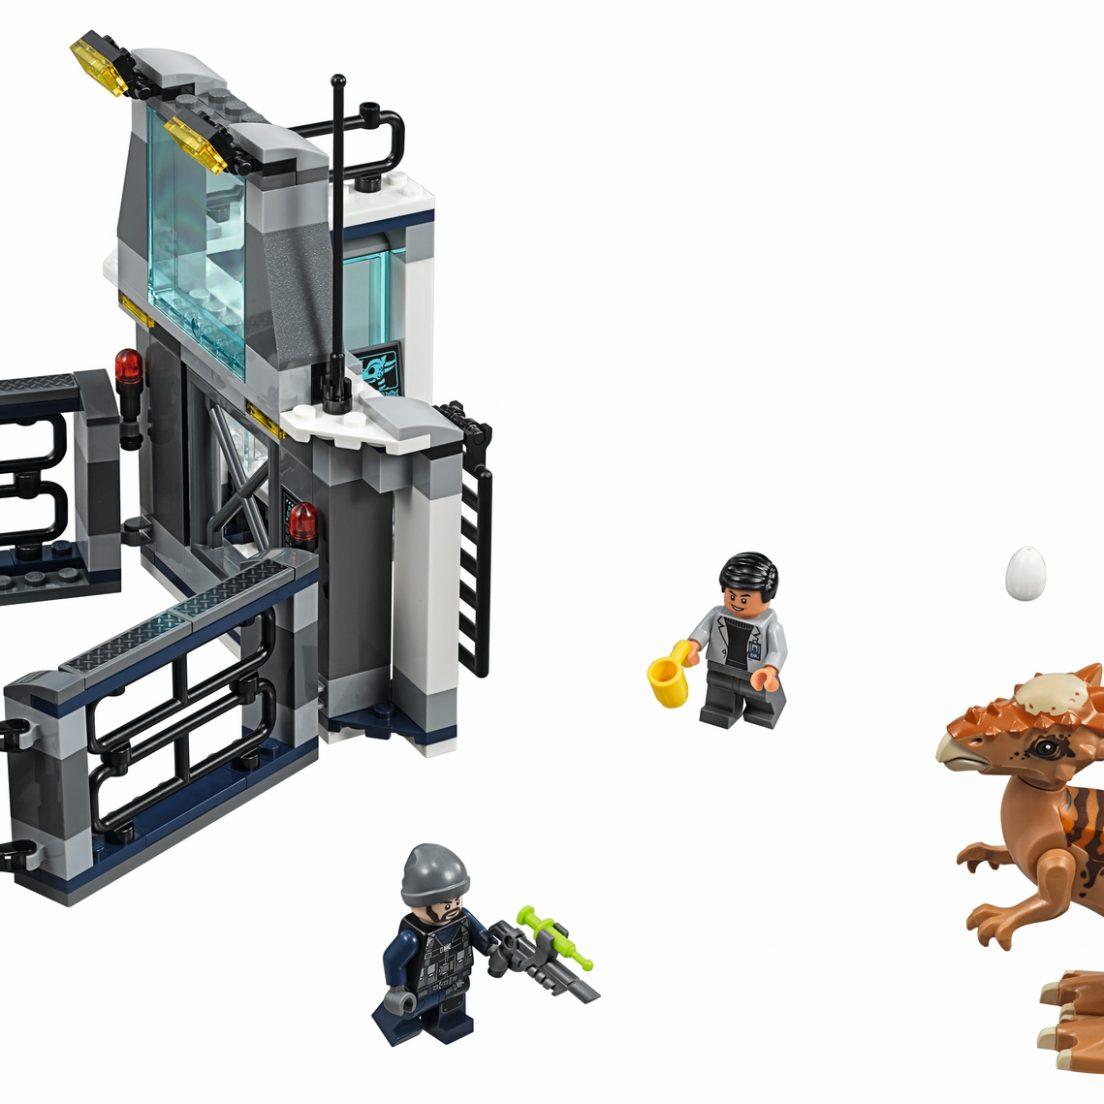 LEGO Jurassic World 75927 Stygimoloch Breakout - full set